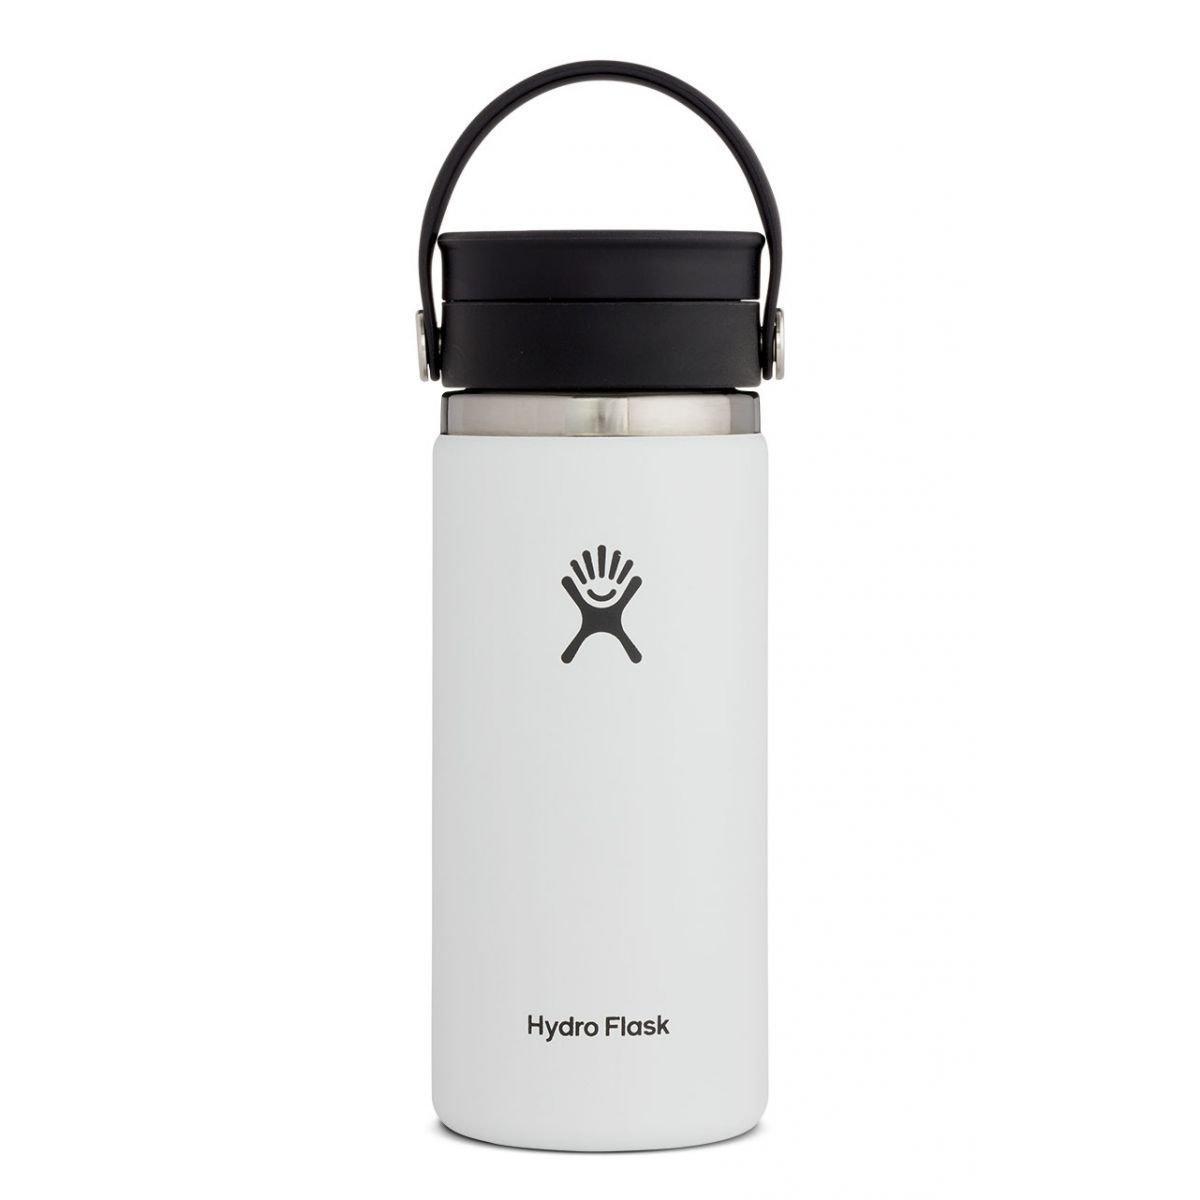 Hydro Flask 16oz Coffee Wide Mouth Flex - White